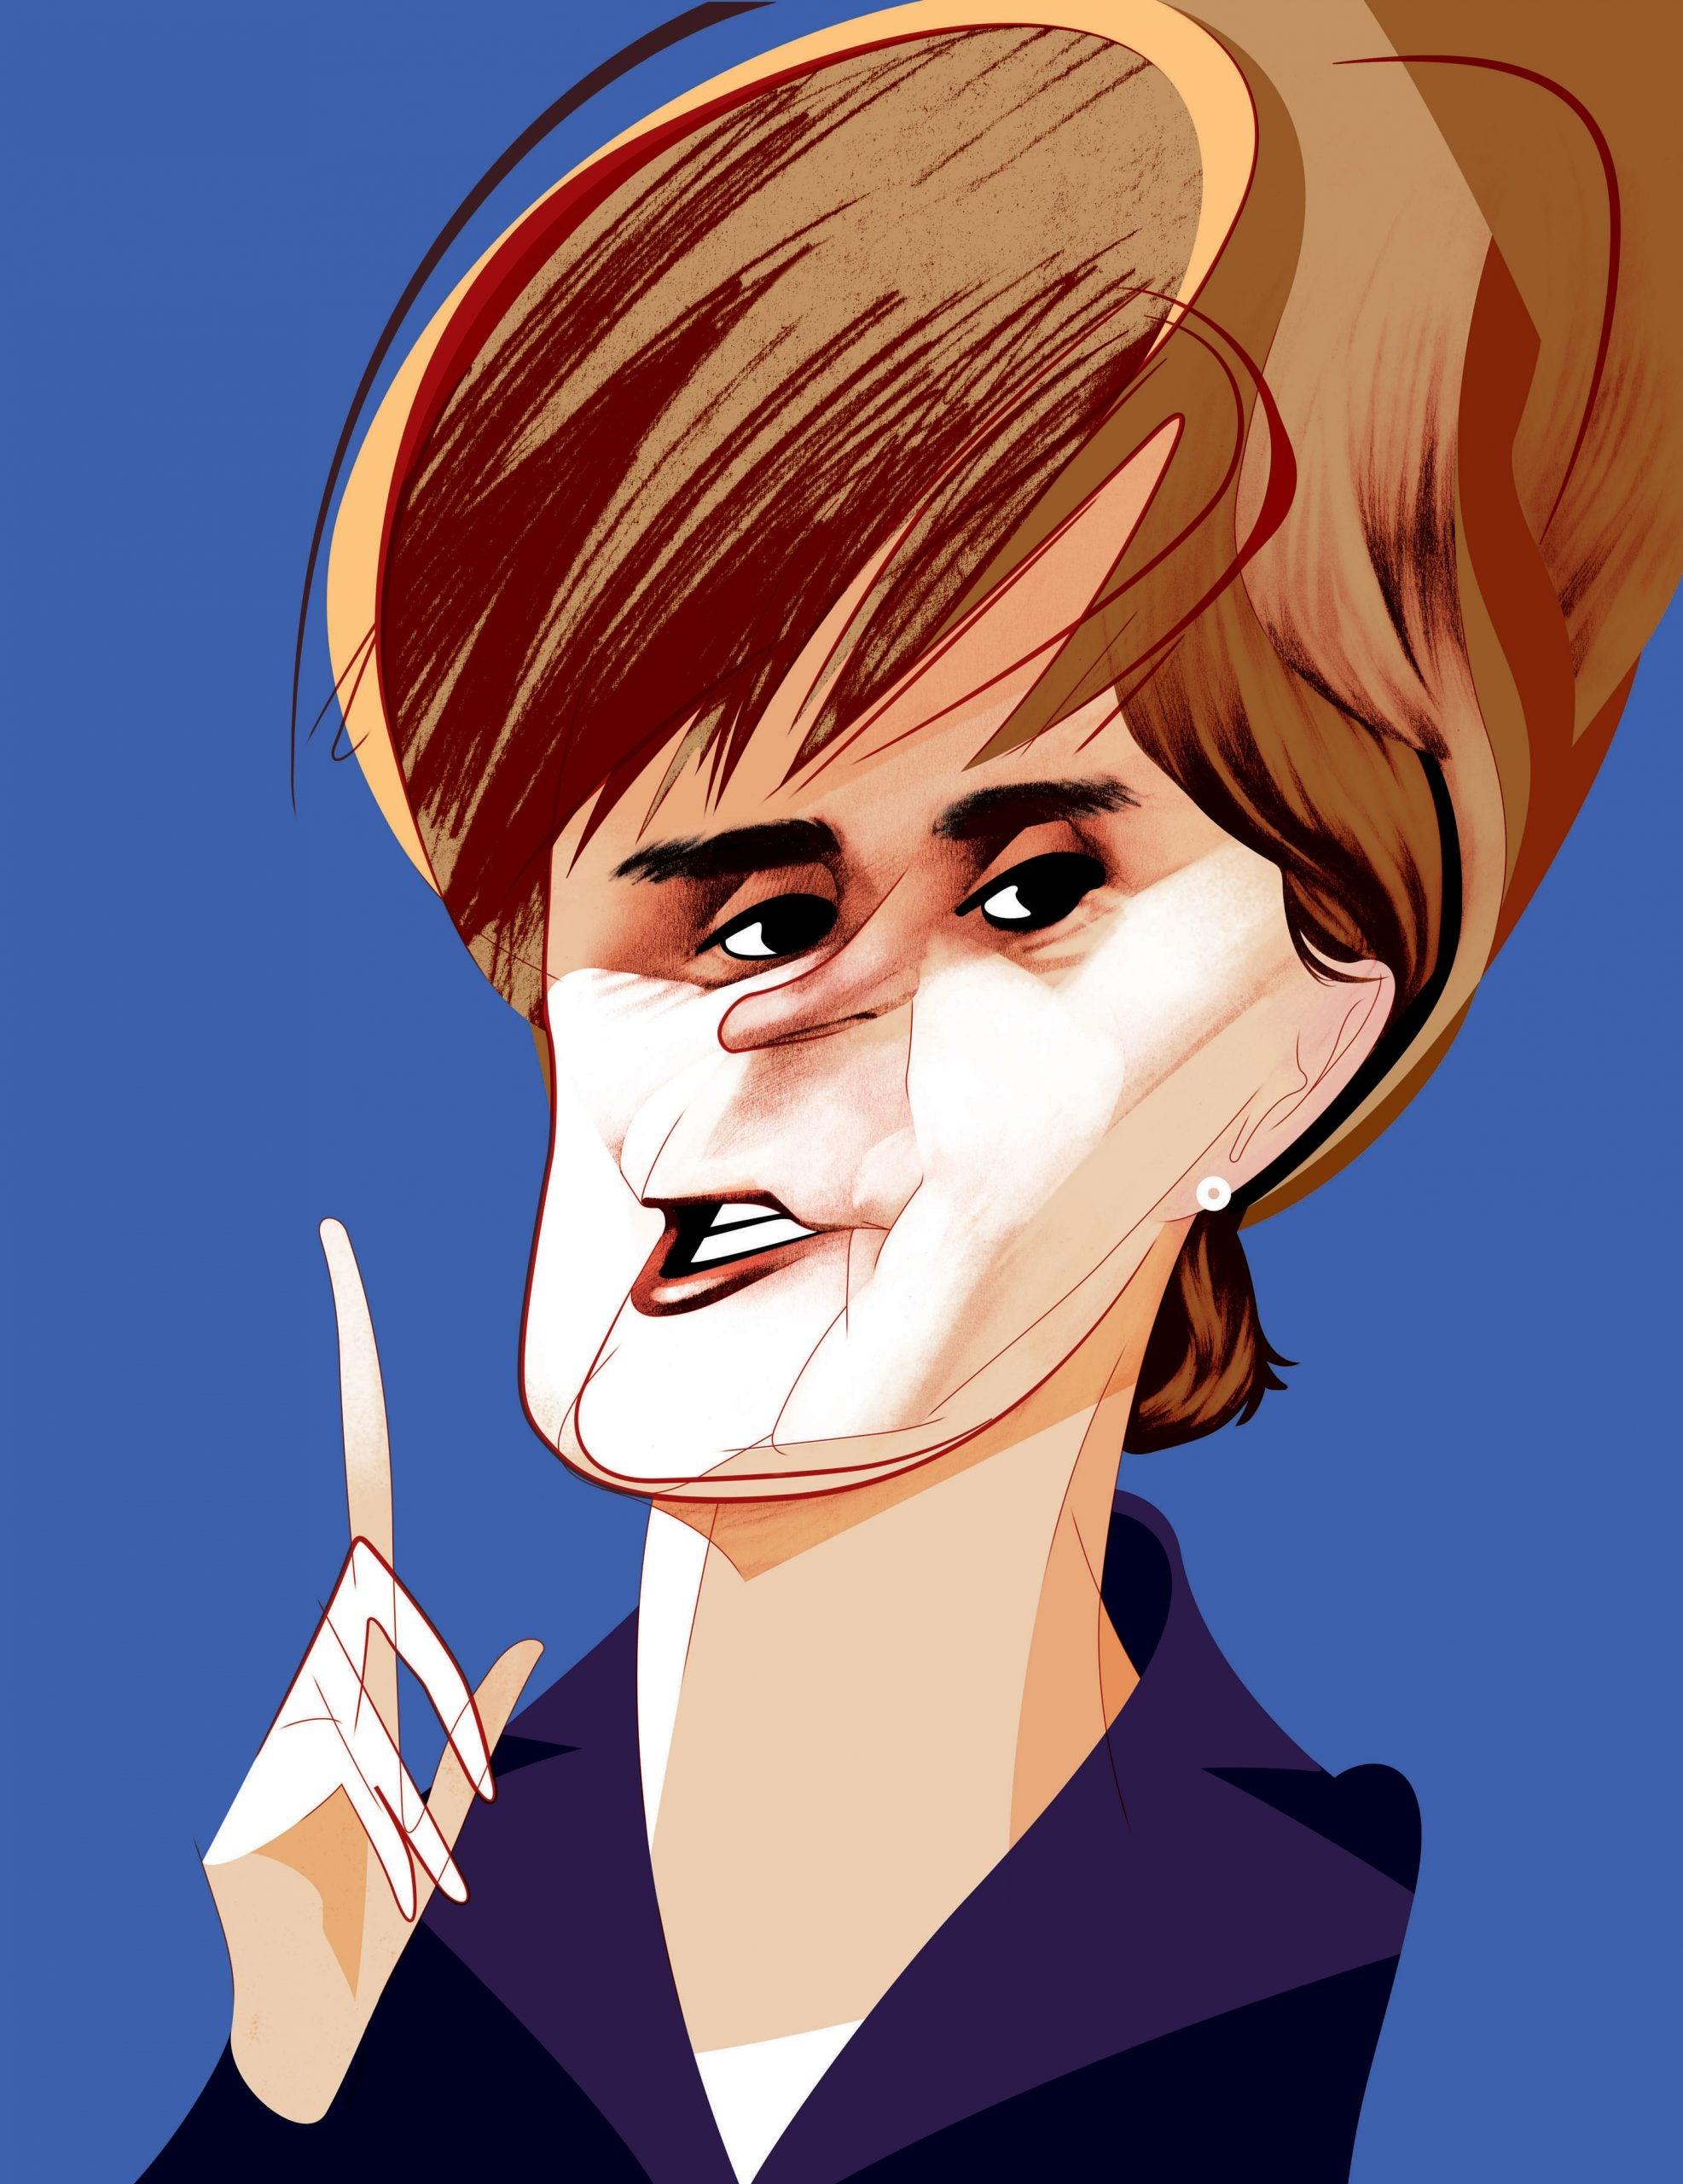 Nicola Sturgeon: Britain's most powerful woman